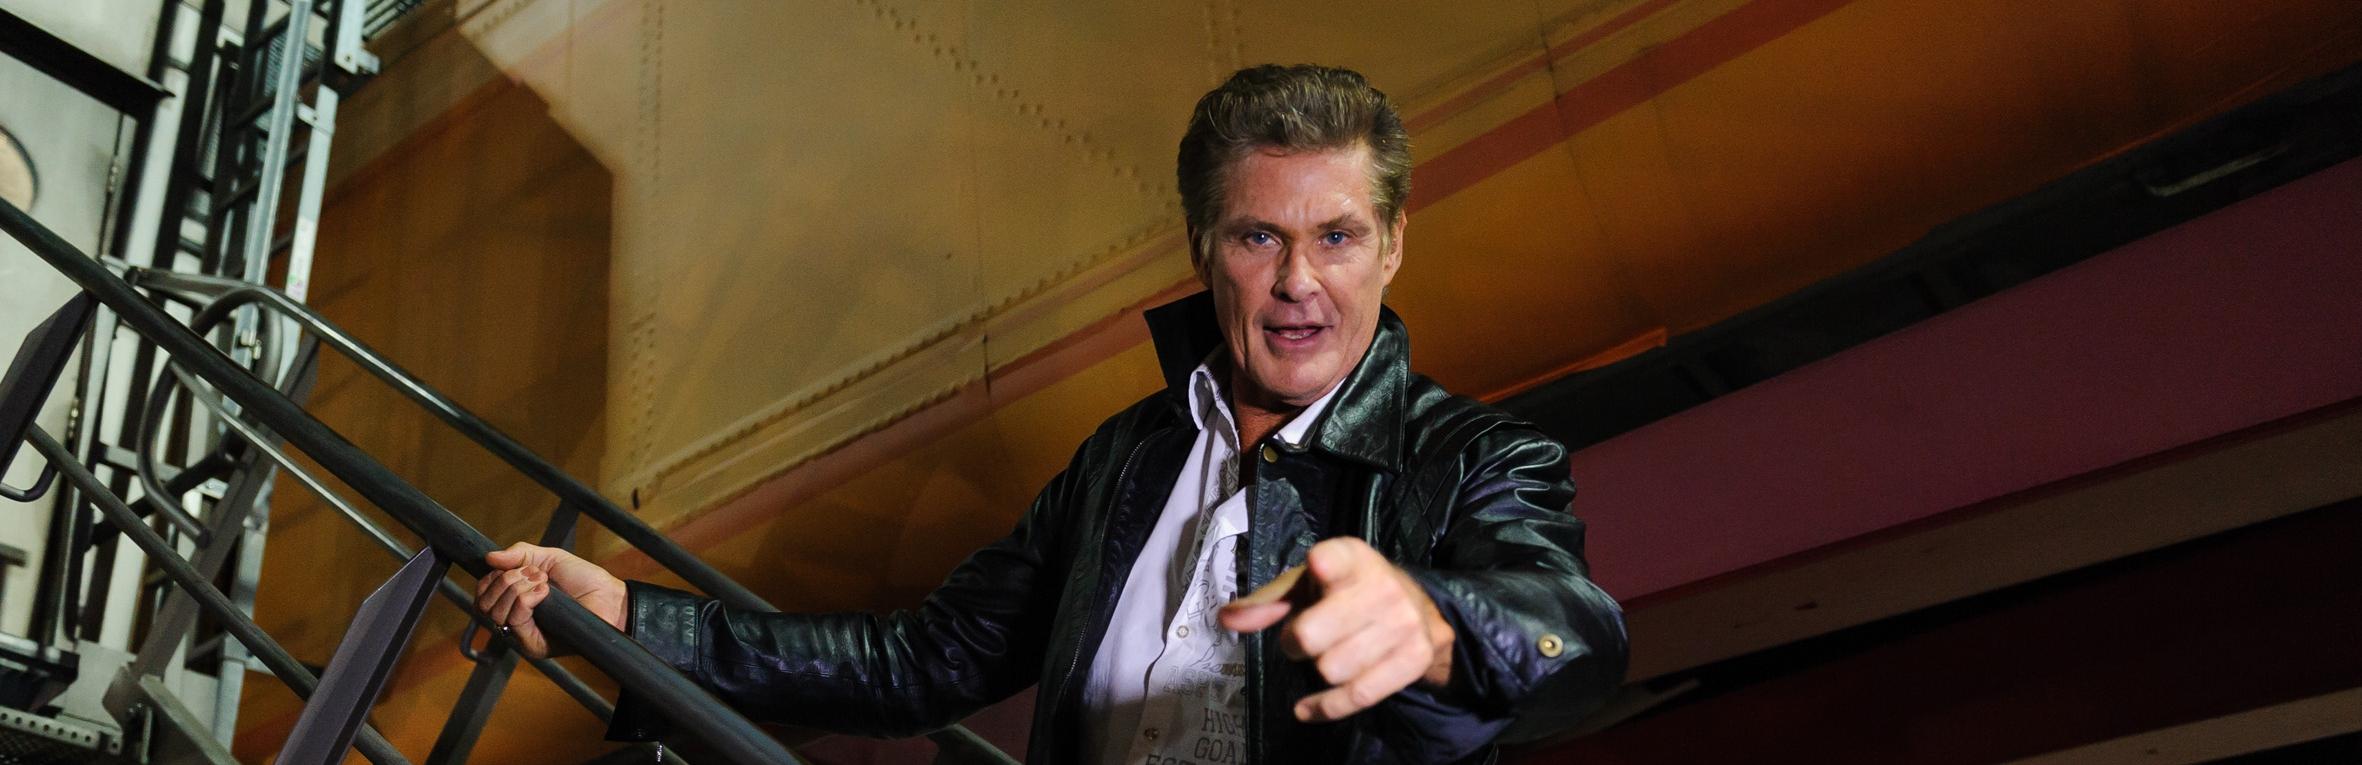 Auszug David Hasselhoff steigt ins Flugzeug Promi Big Brother 2013